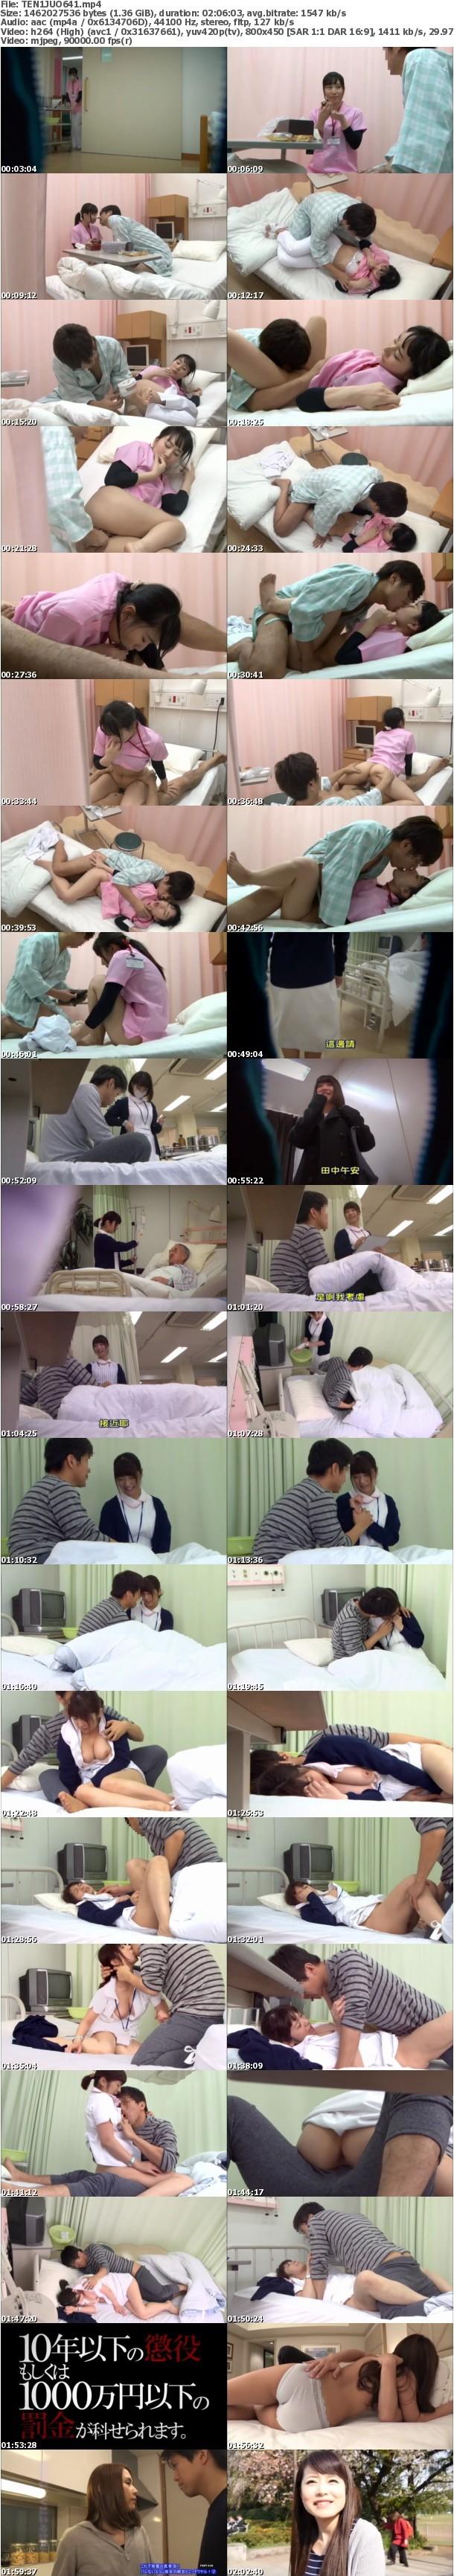 [FSET-641] 搭訕現任護士與她們交涉與住院中變得親密的病患2人單獨在病房內做愛是否成功?[中文字幕]